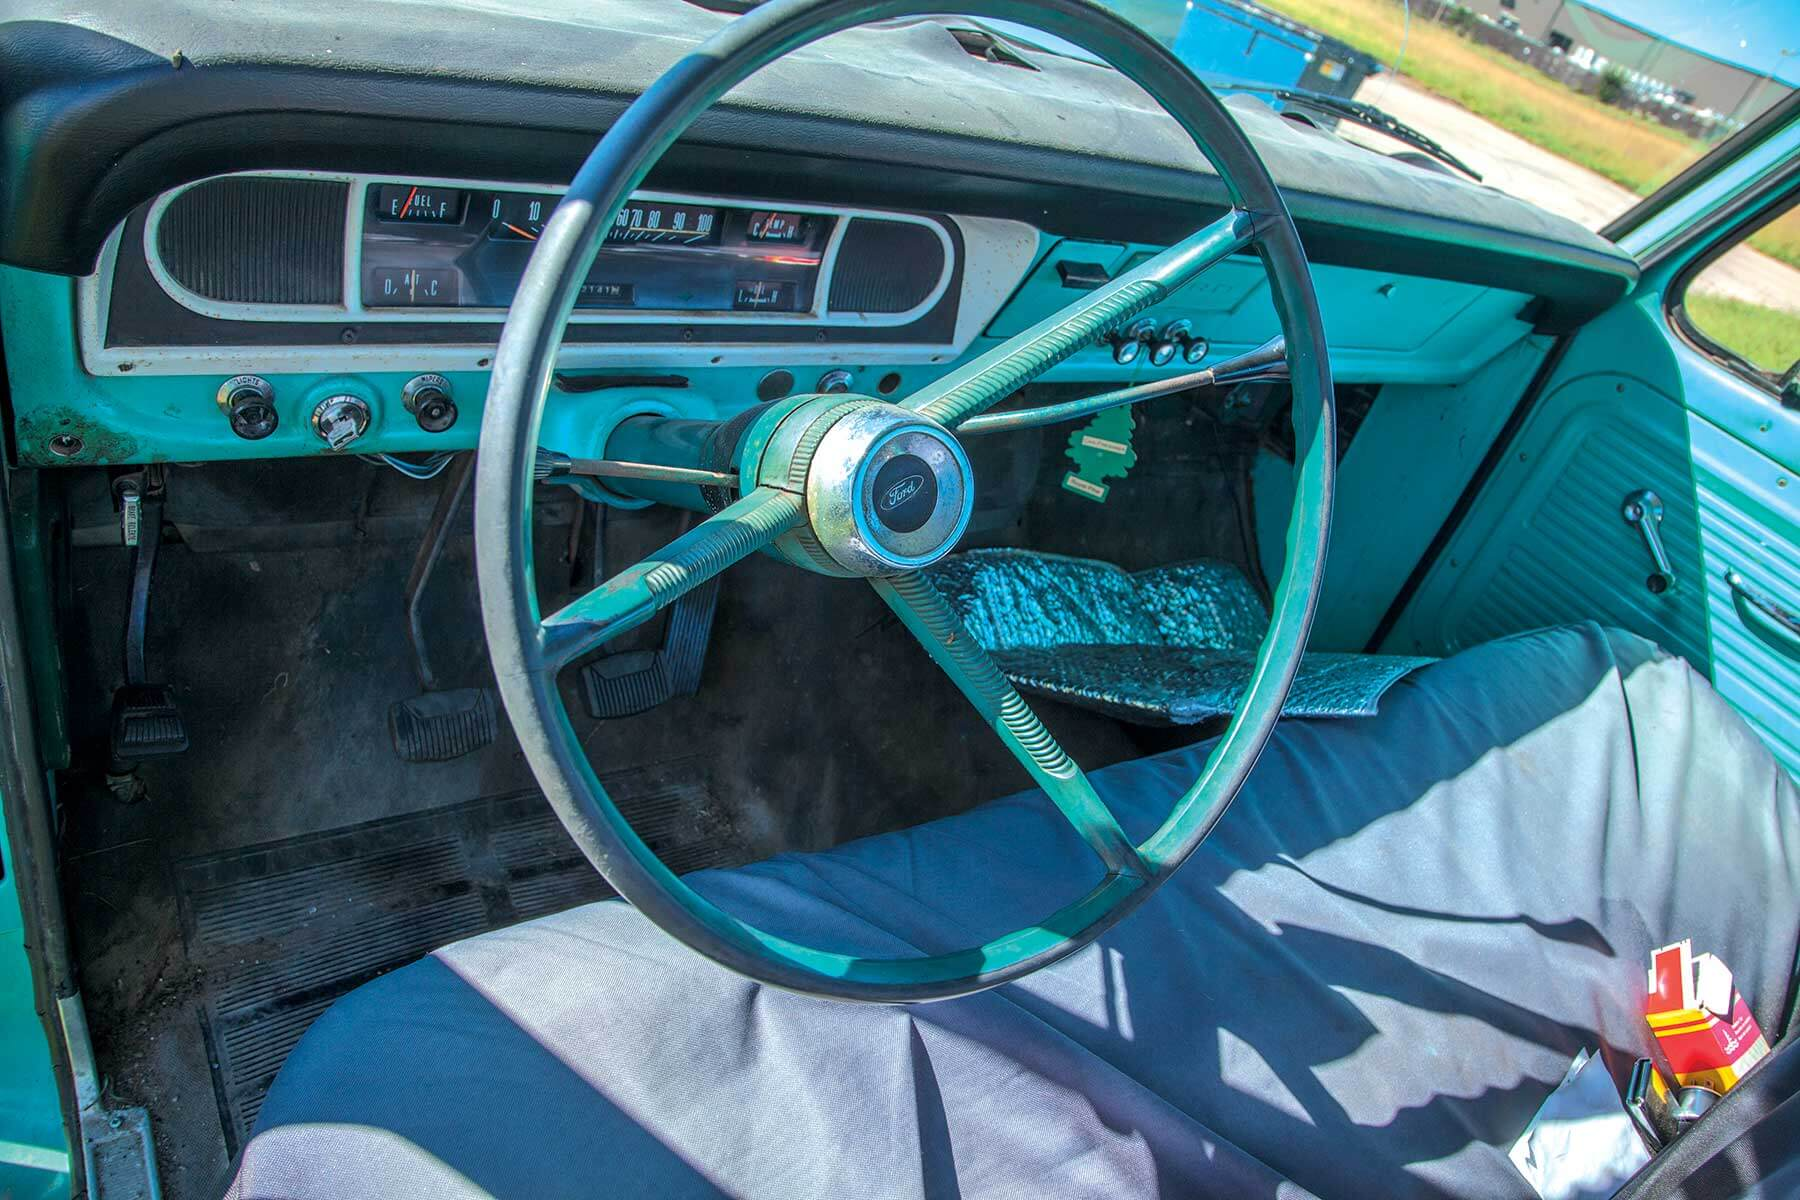 1967 Ford F100 Steering Wheel 1955 Truck Wheels